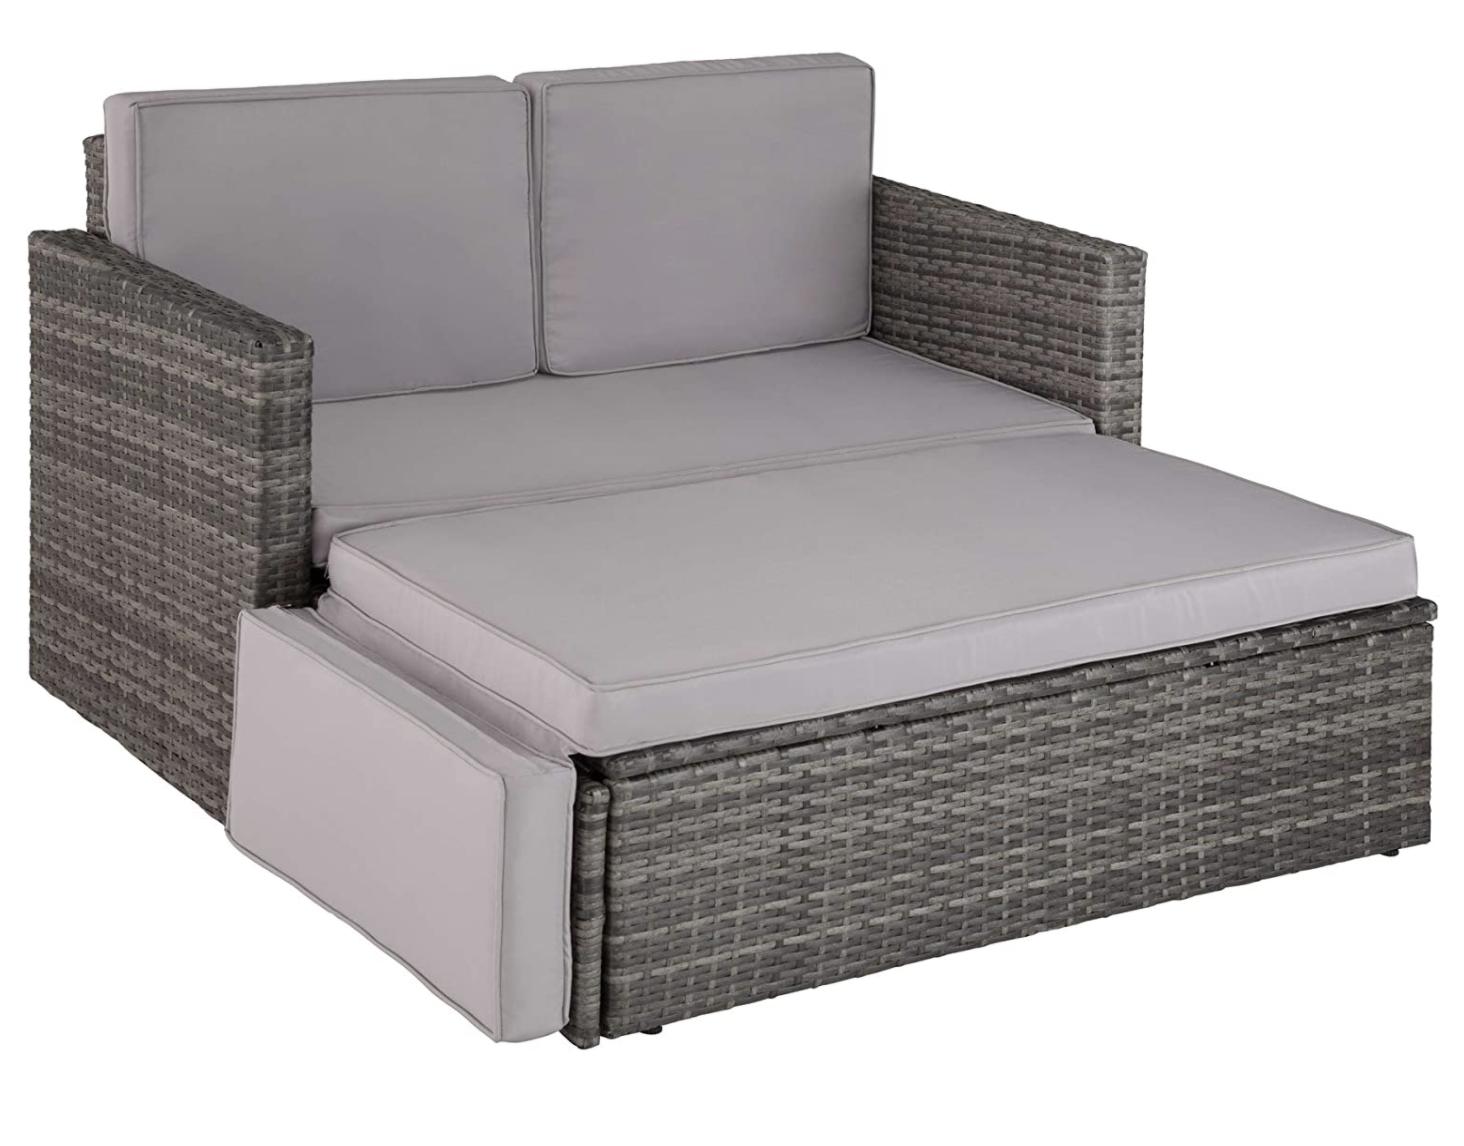 Amazon Garden Bed